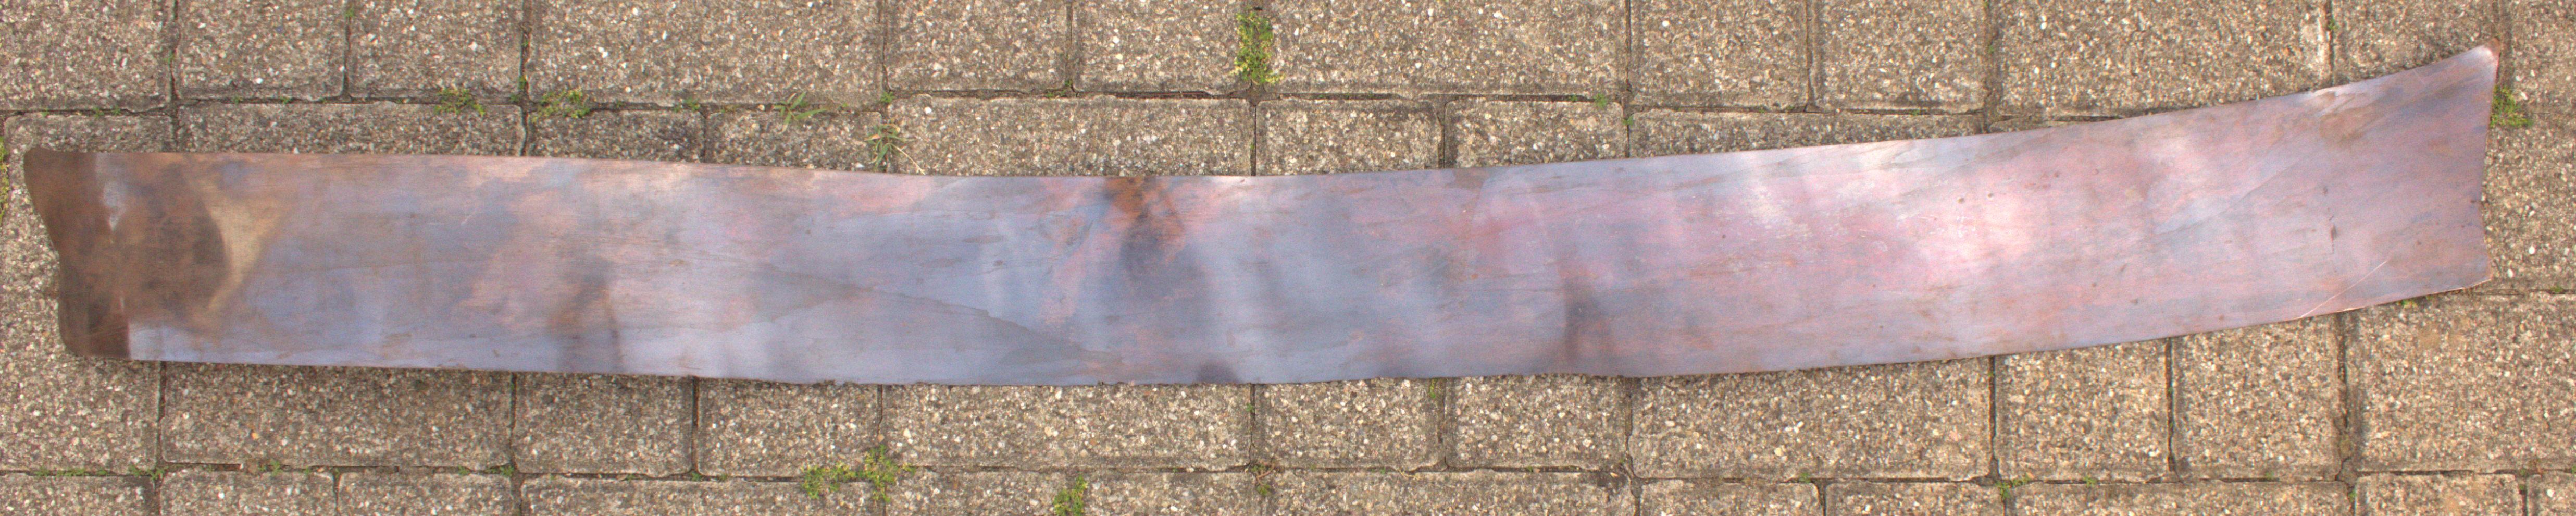 Buntmetallblech: Rottombak, Stärke 0,35 mm